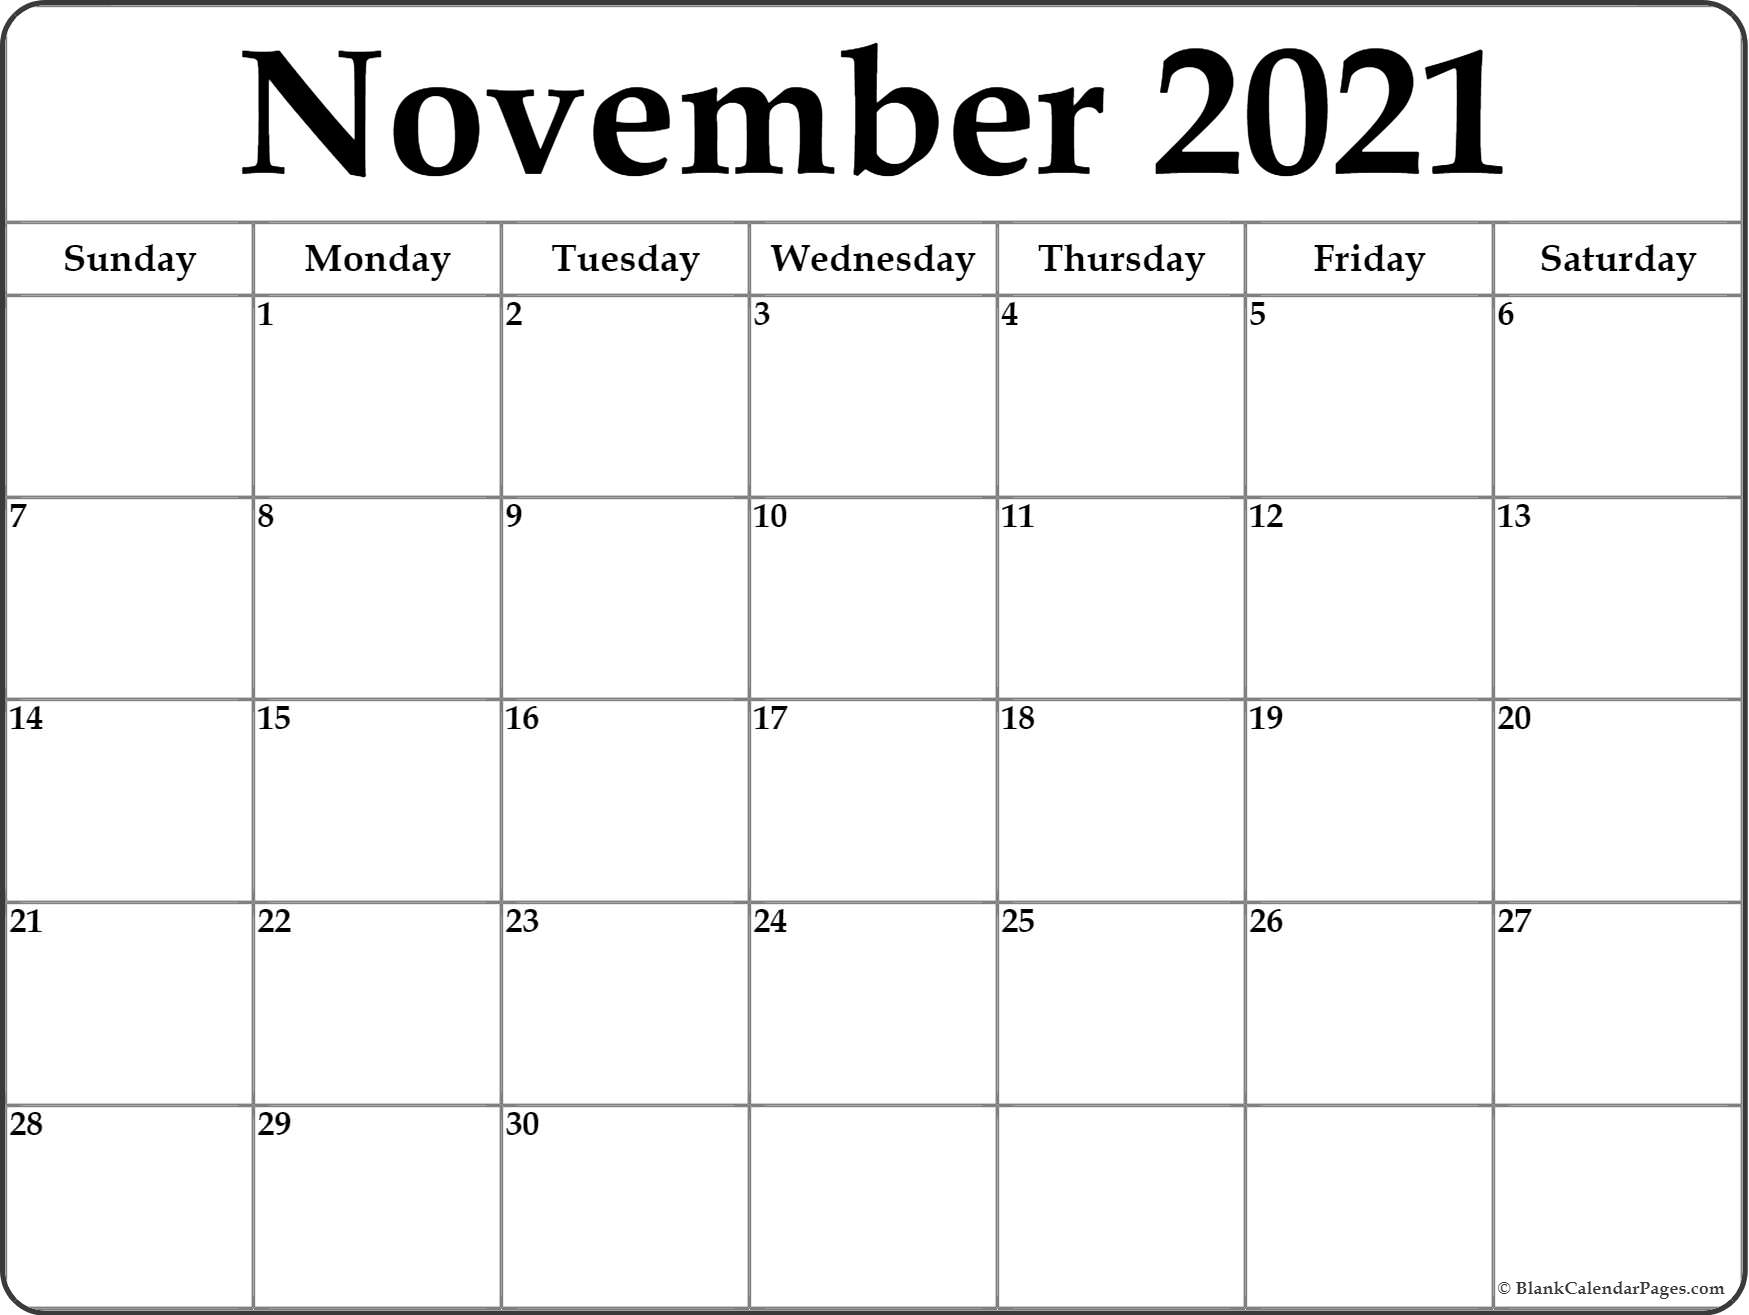 November 2021 Calendar   Free Printable Monthly Calendars For Calendar With November 2021 Mexican Names